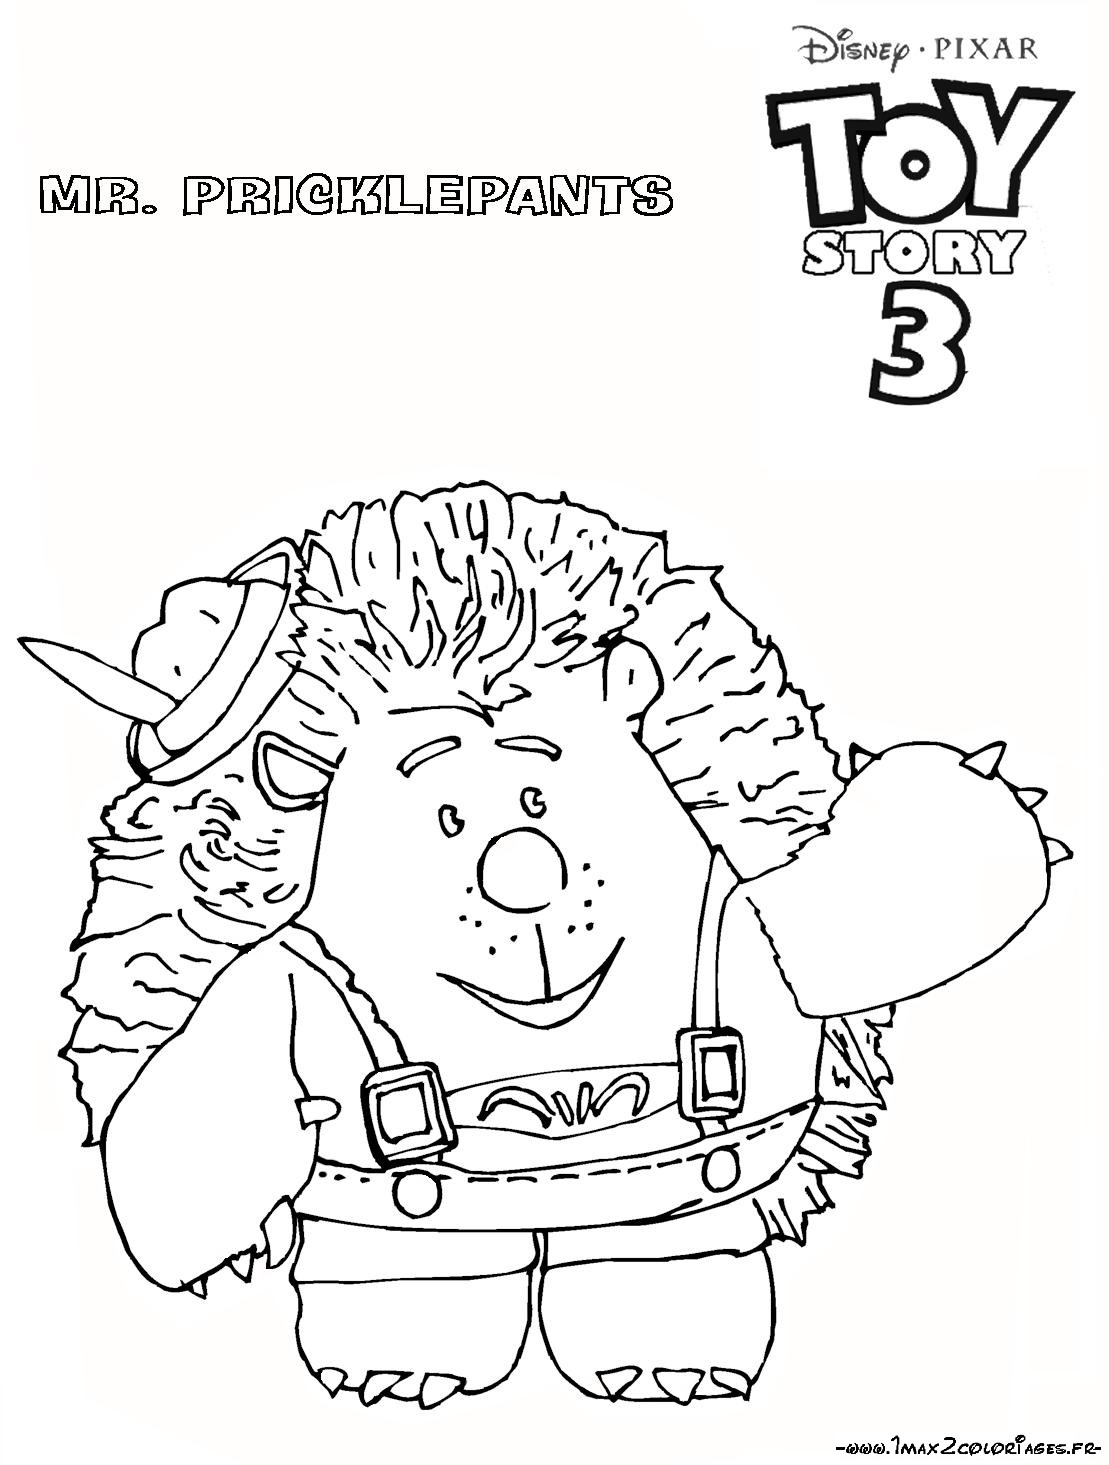 10 toys story 3 coloriage - Coloriage pixar ...